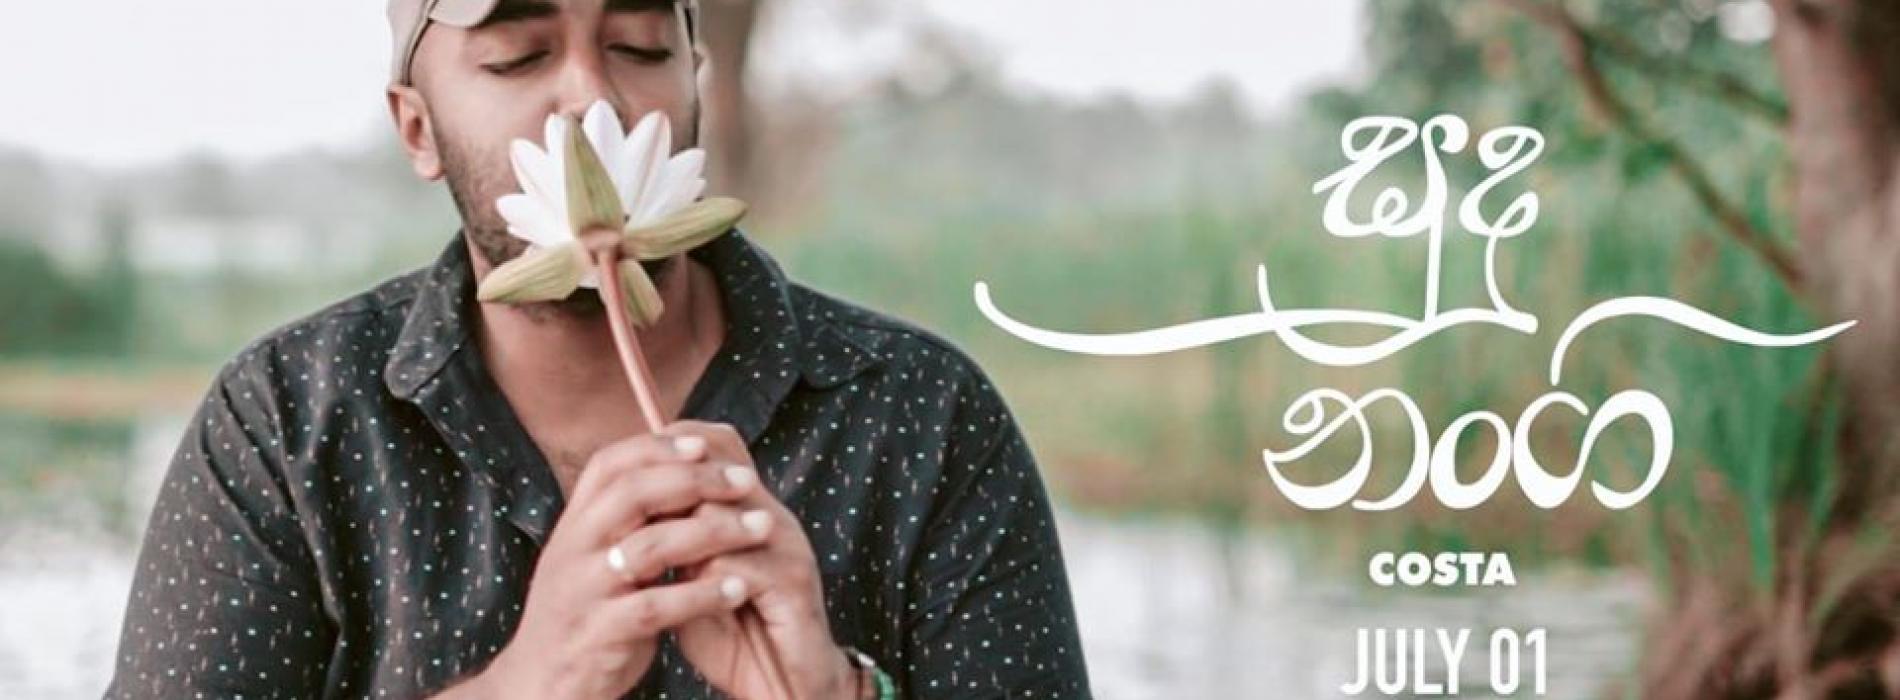 New Music: Costa x Niklesha Costa – Sudu Nangi සුදු නංගි (Official Music Video)